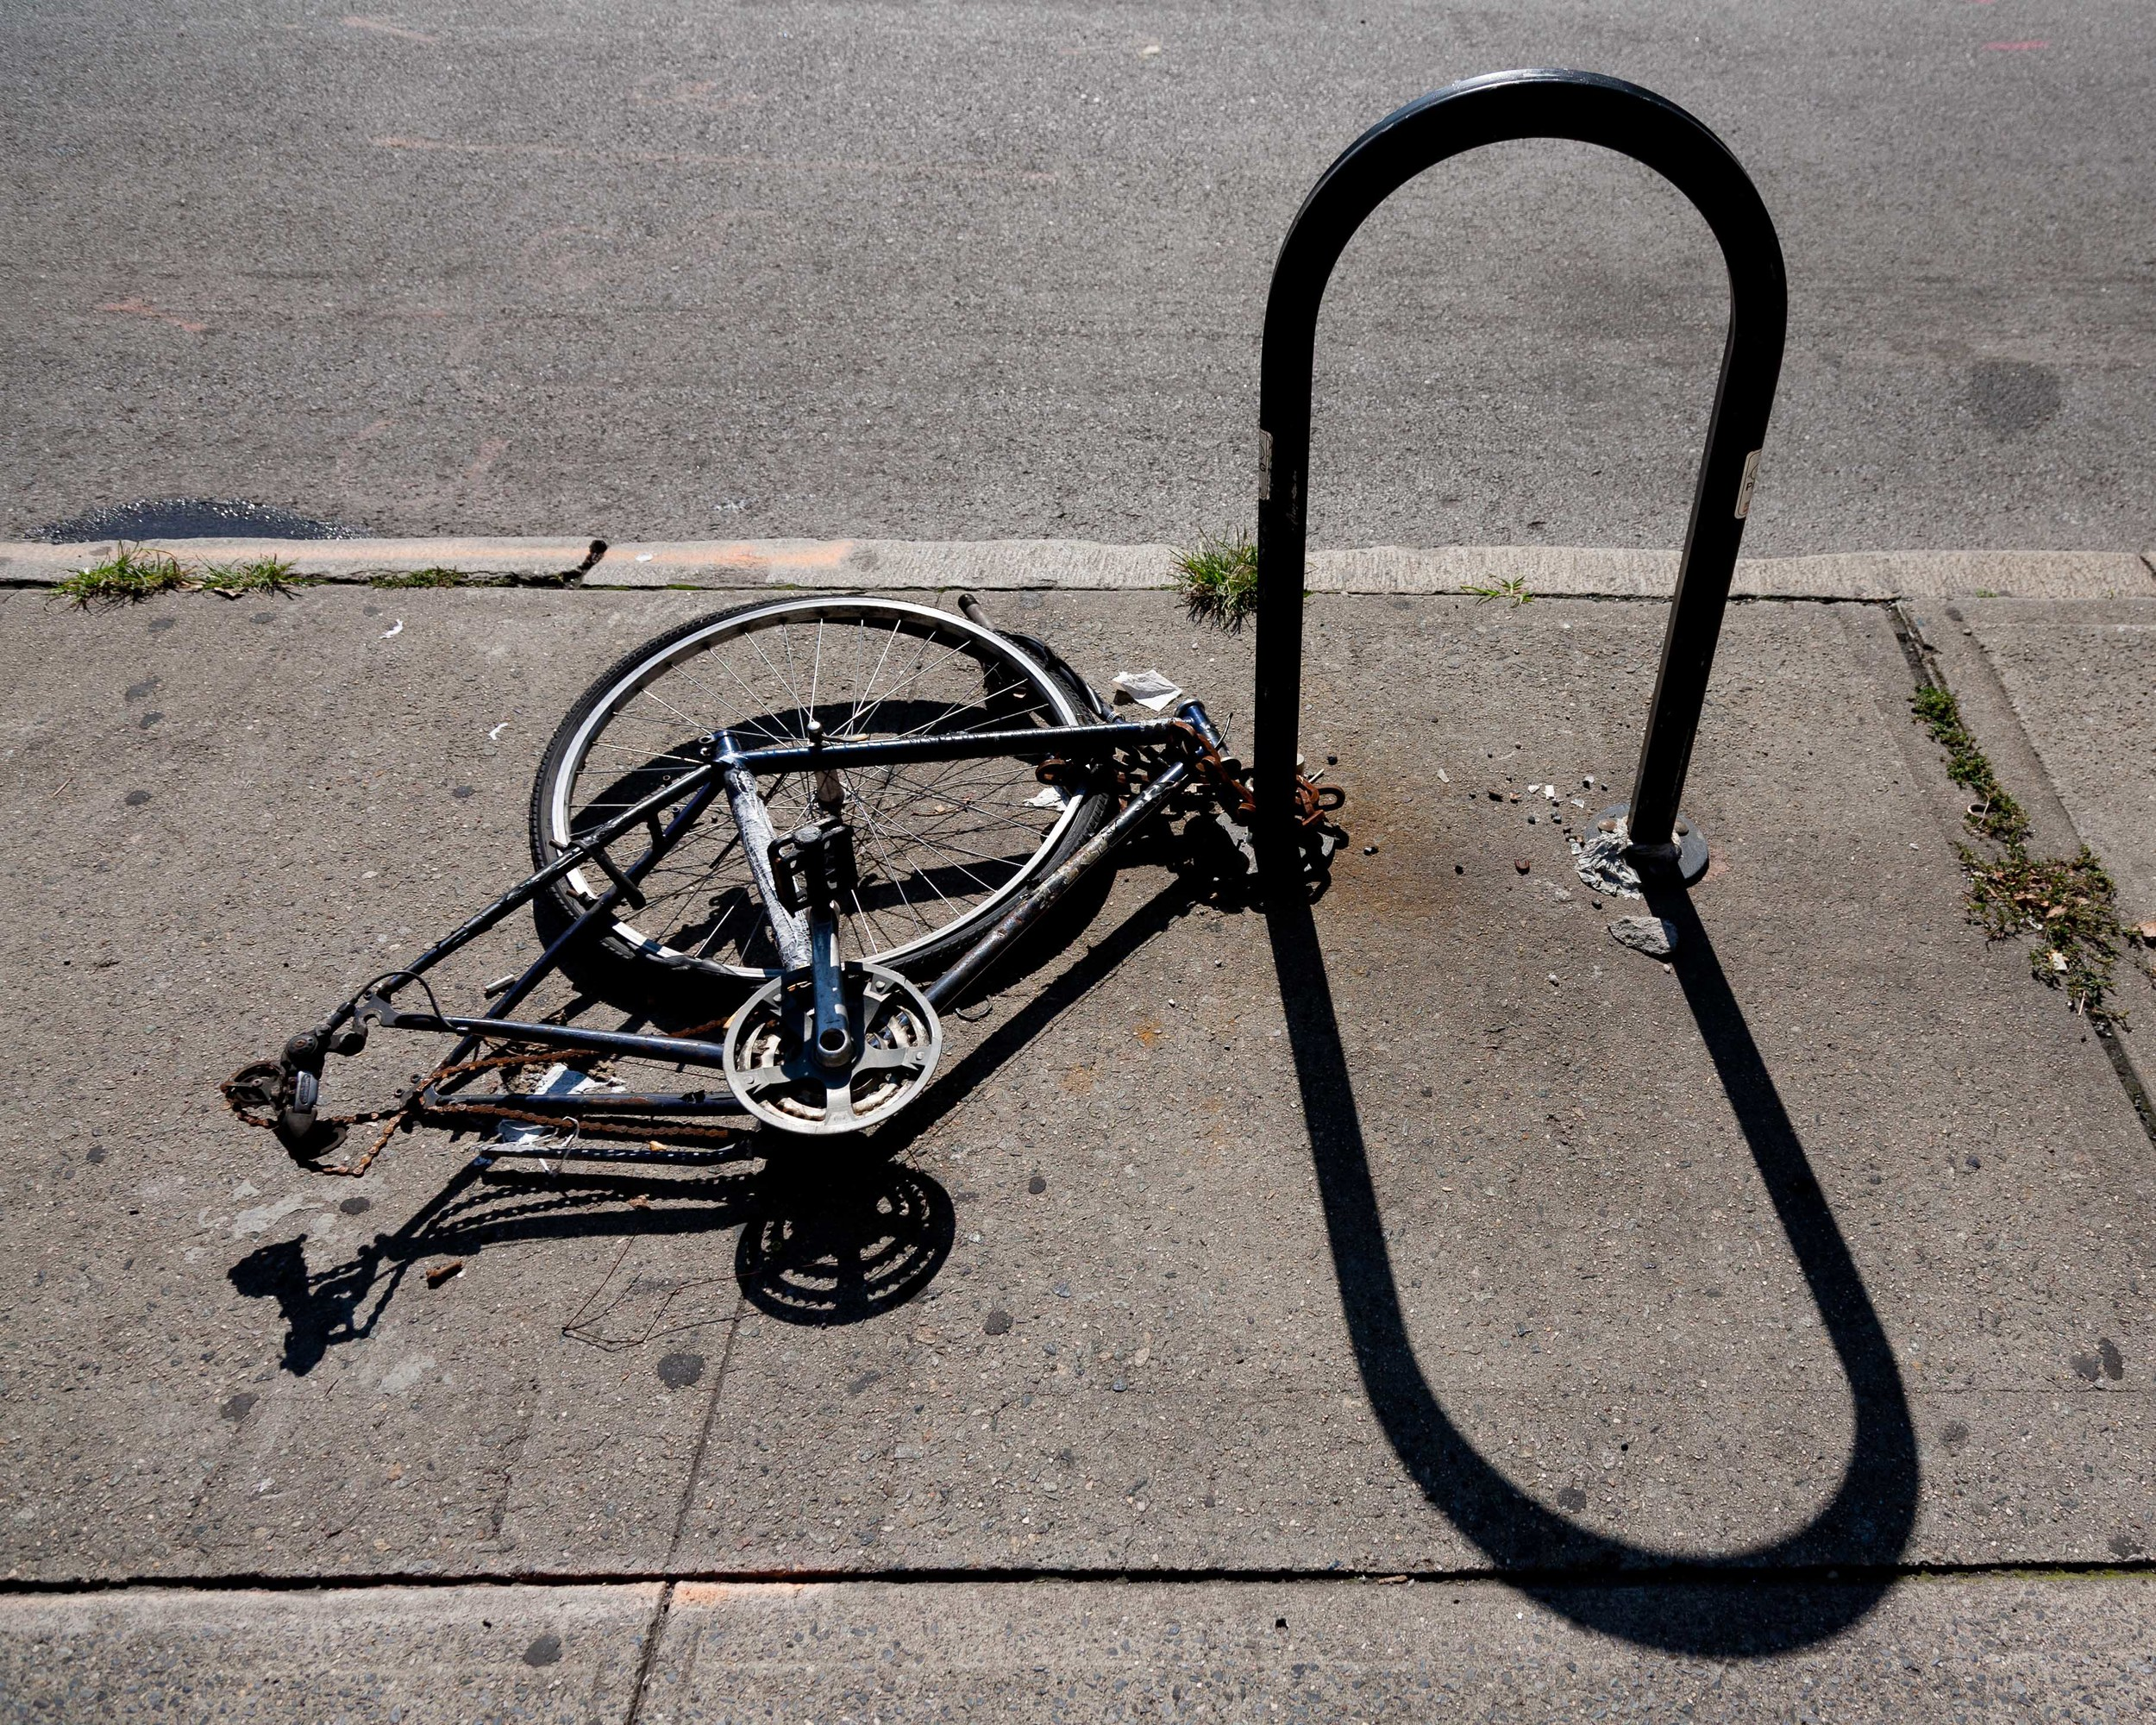 Bikescapes-13.jpg